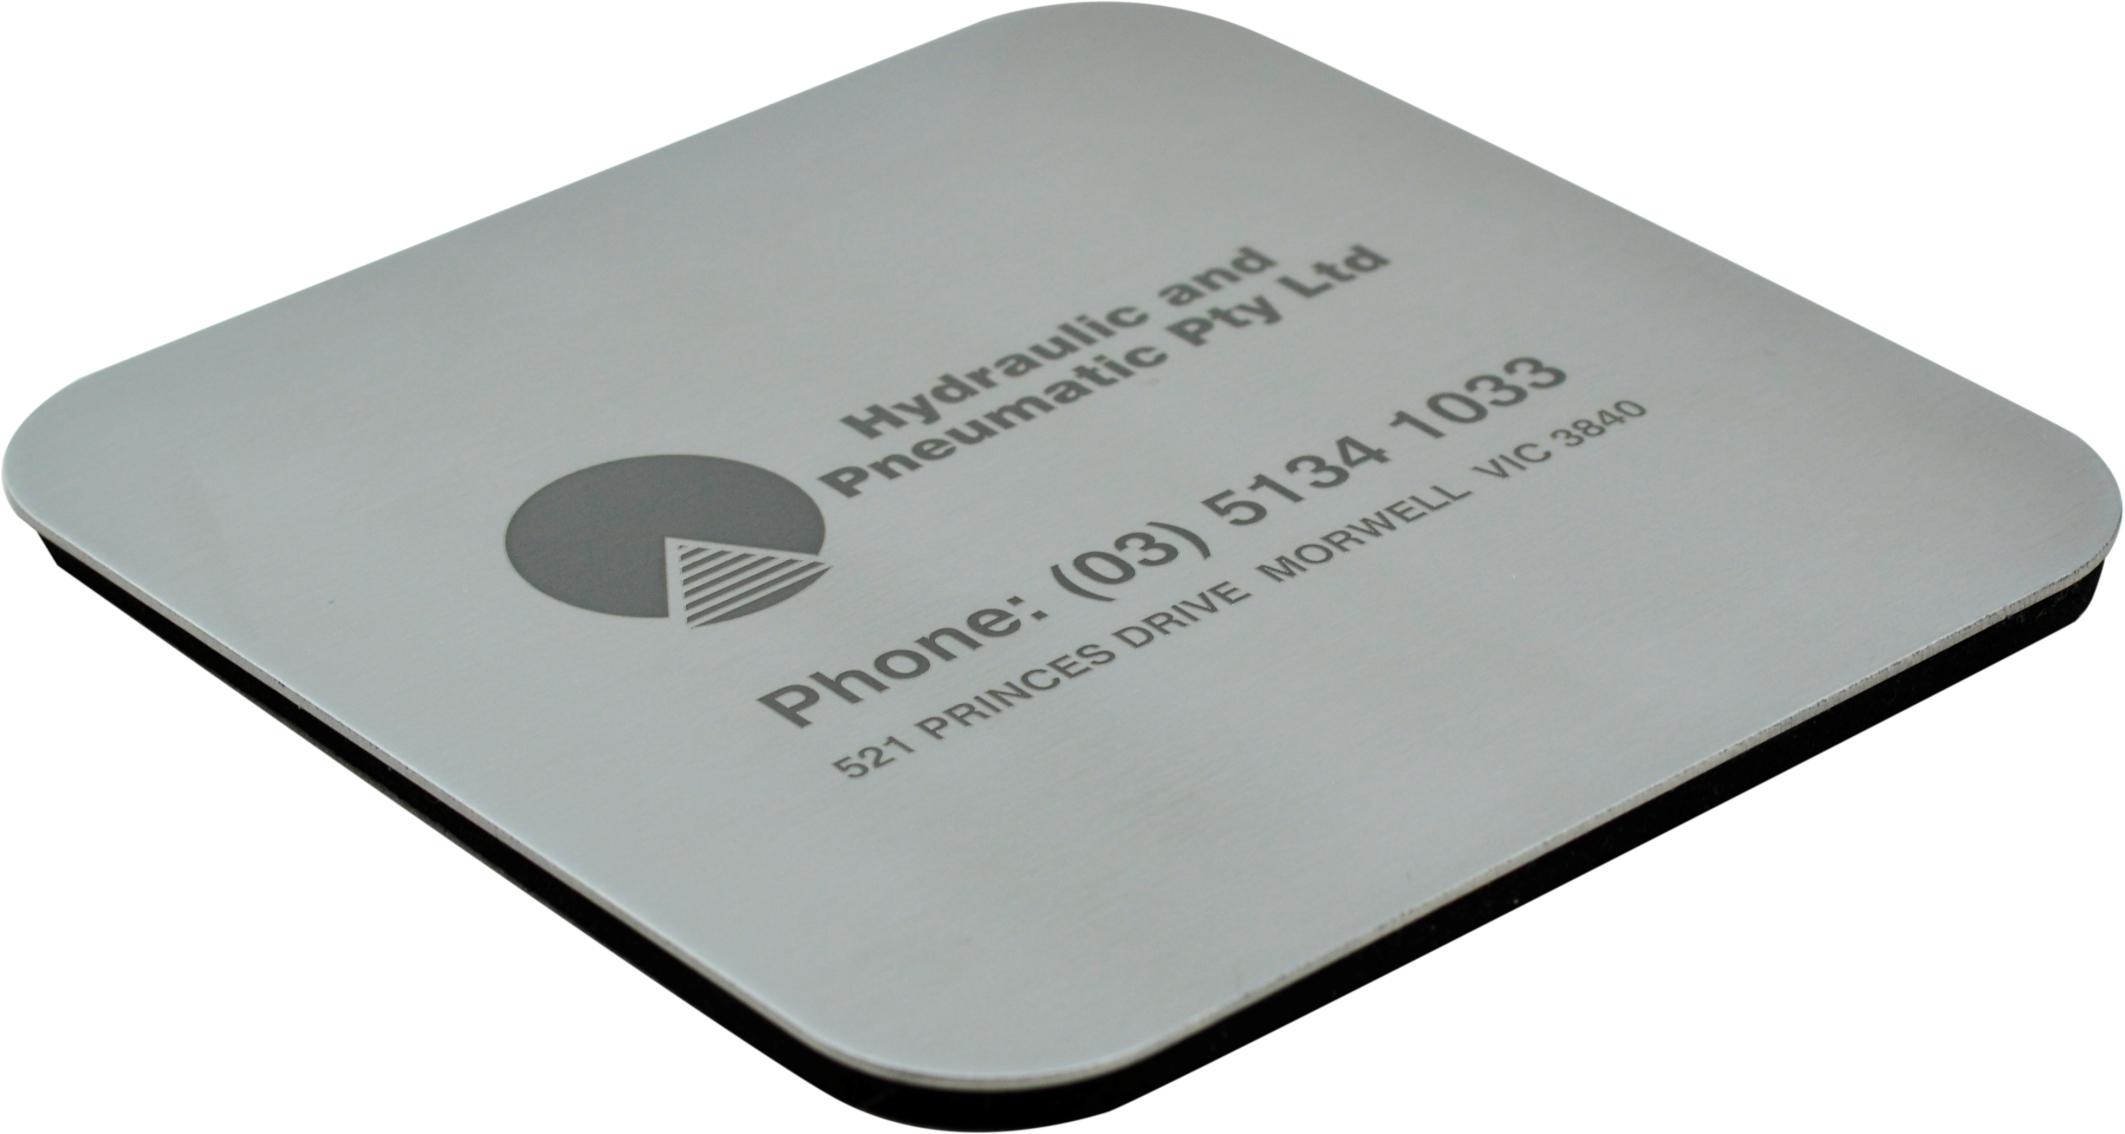 Promotional Product Strata Coaster - Individual